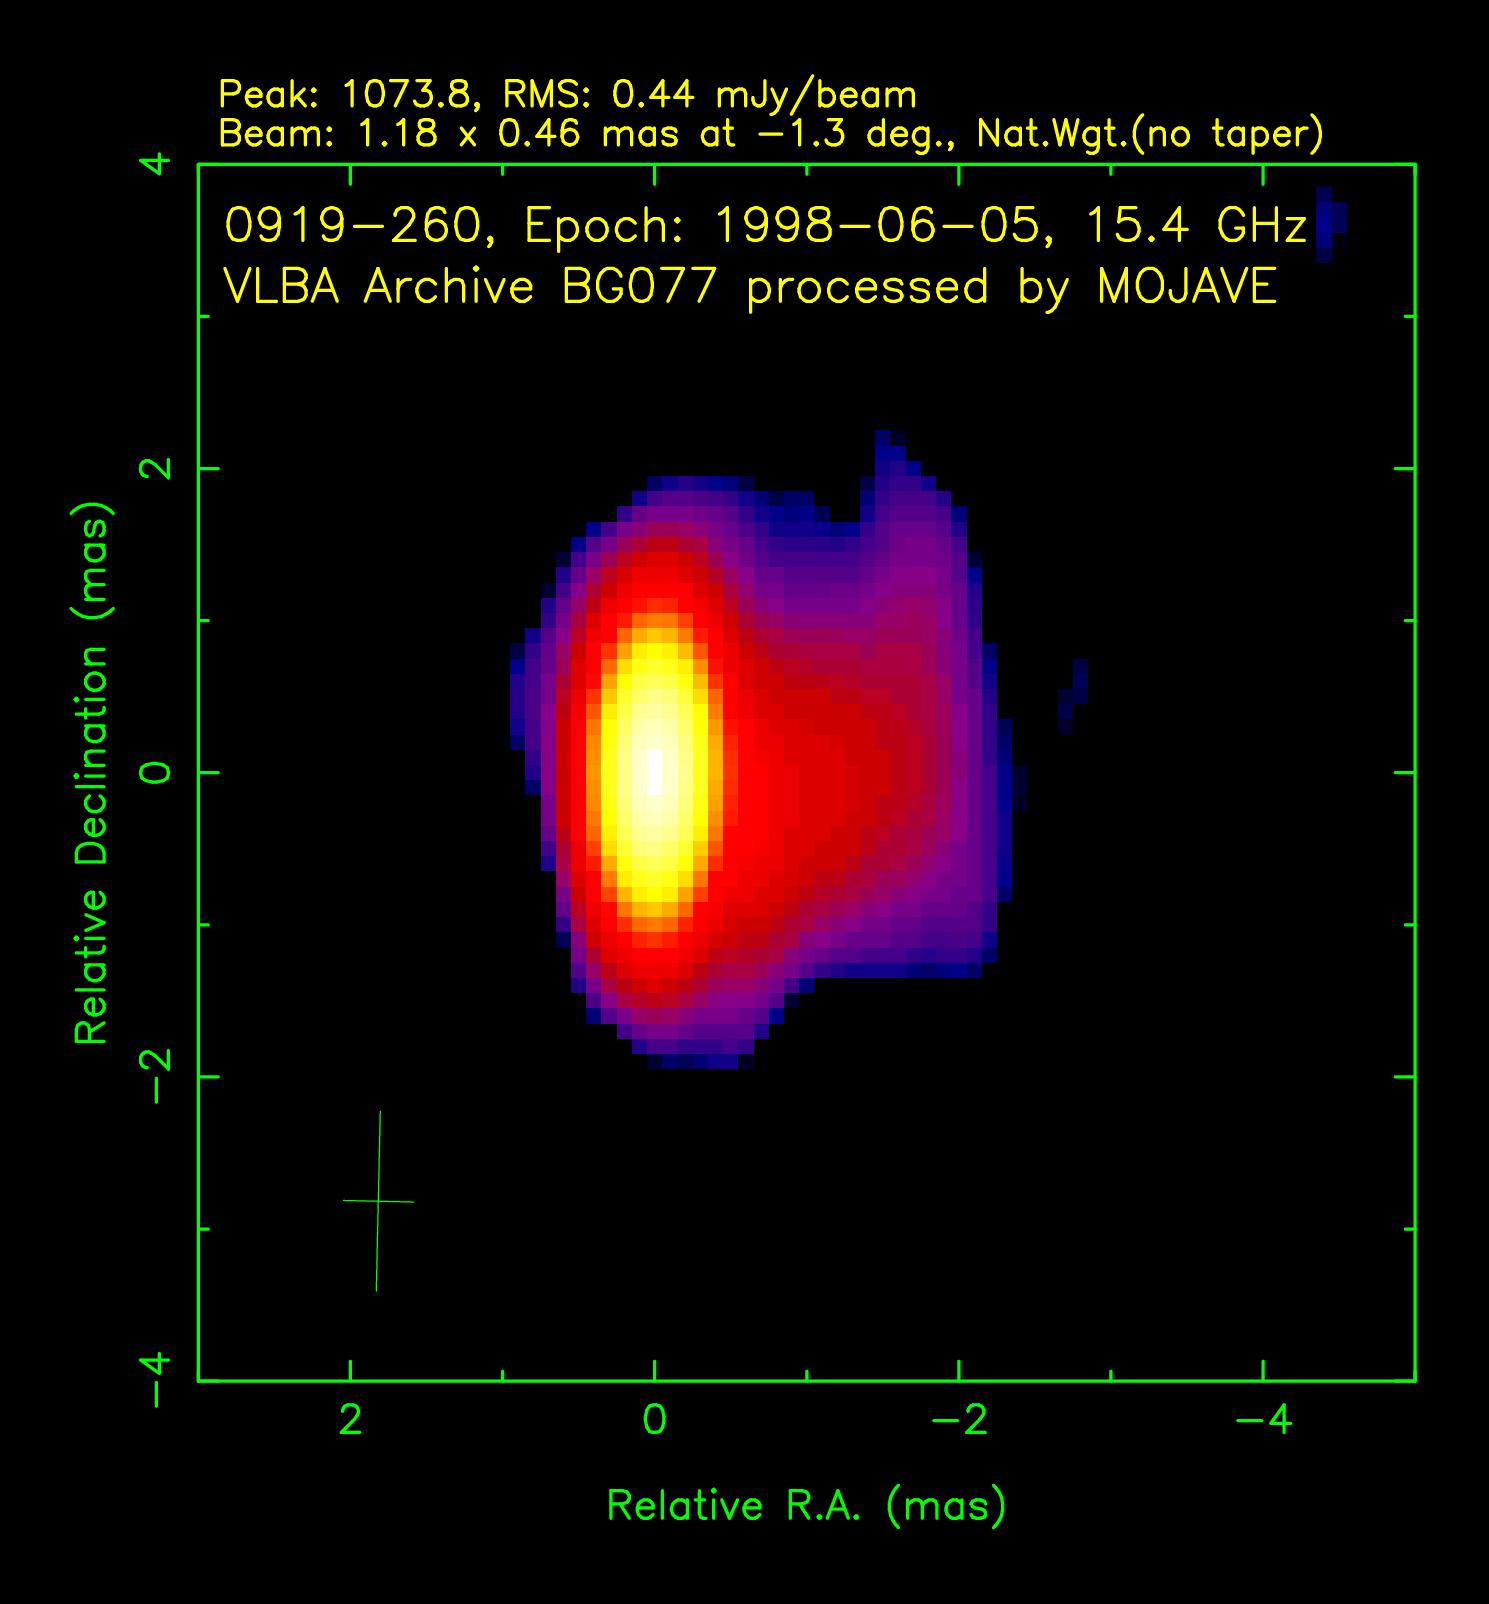 2 cm VLBA Image